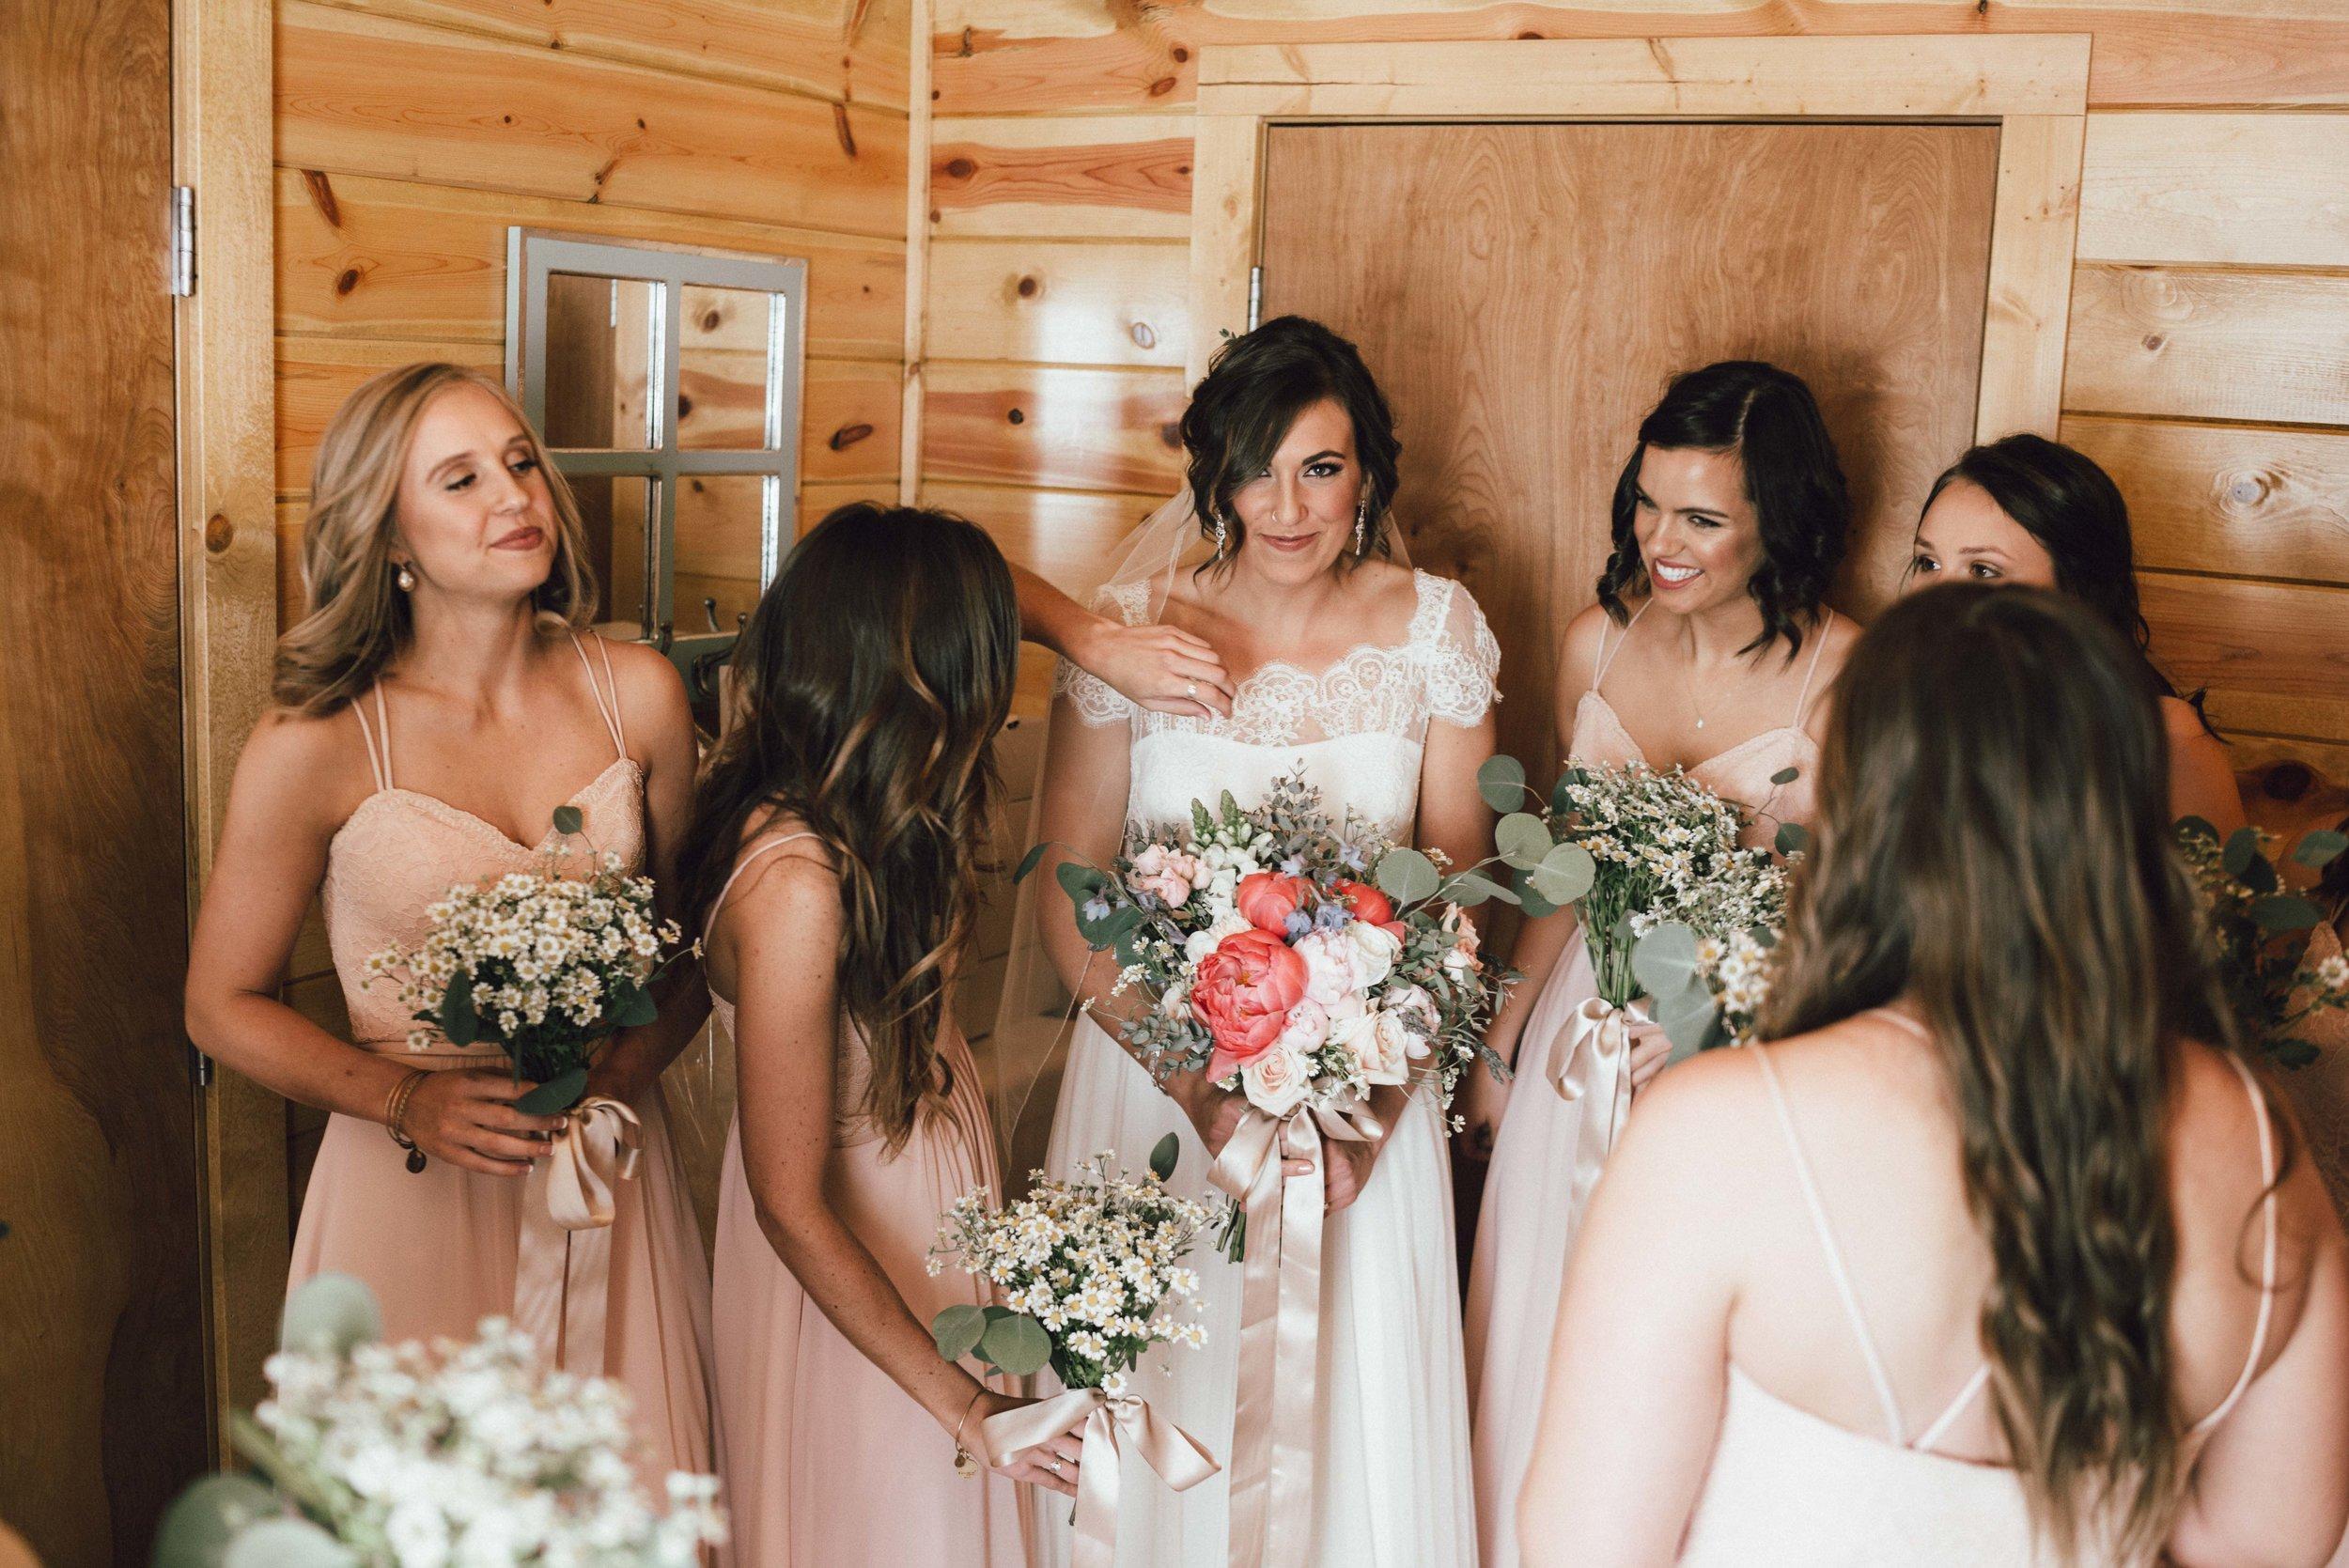 Steph-Ben-Blog-Indianapolis-Wedding-26.jpg